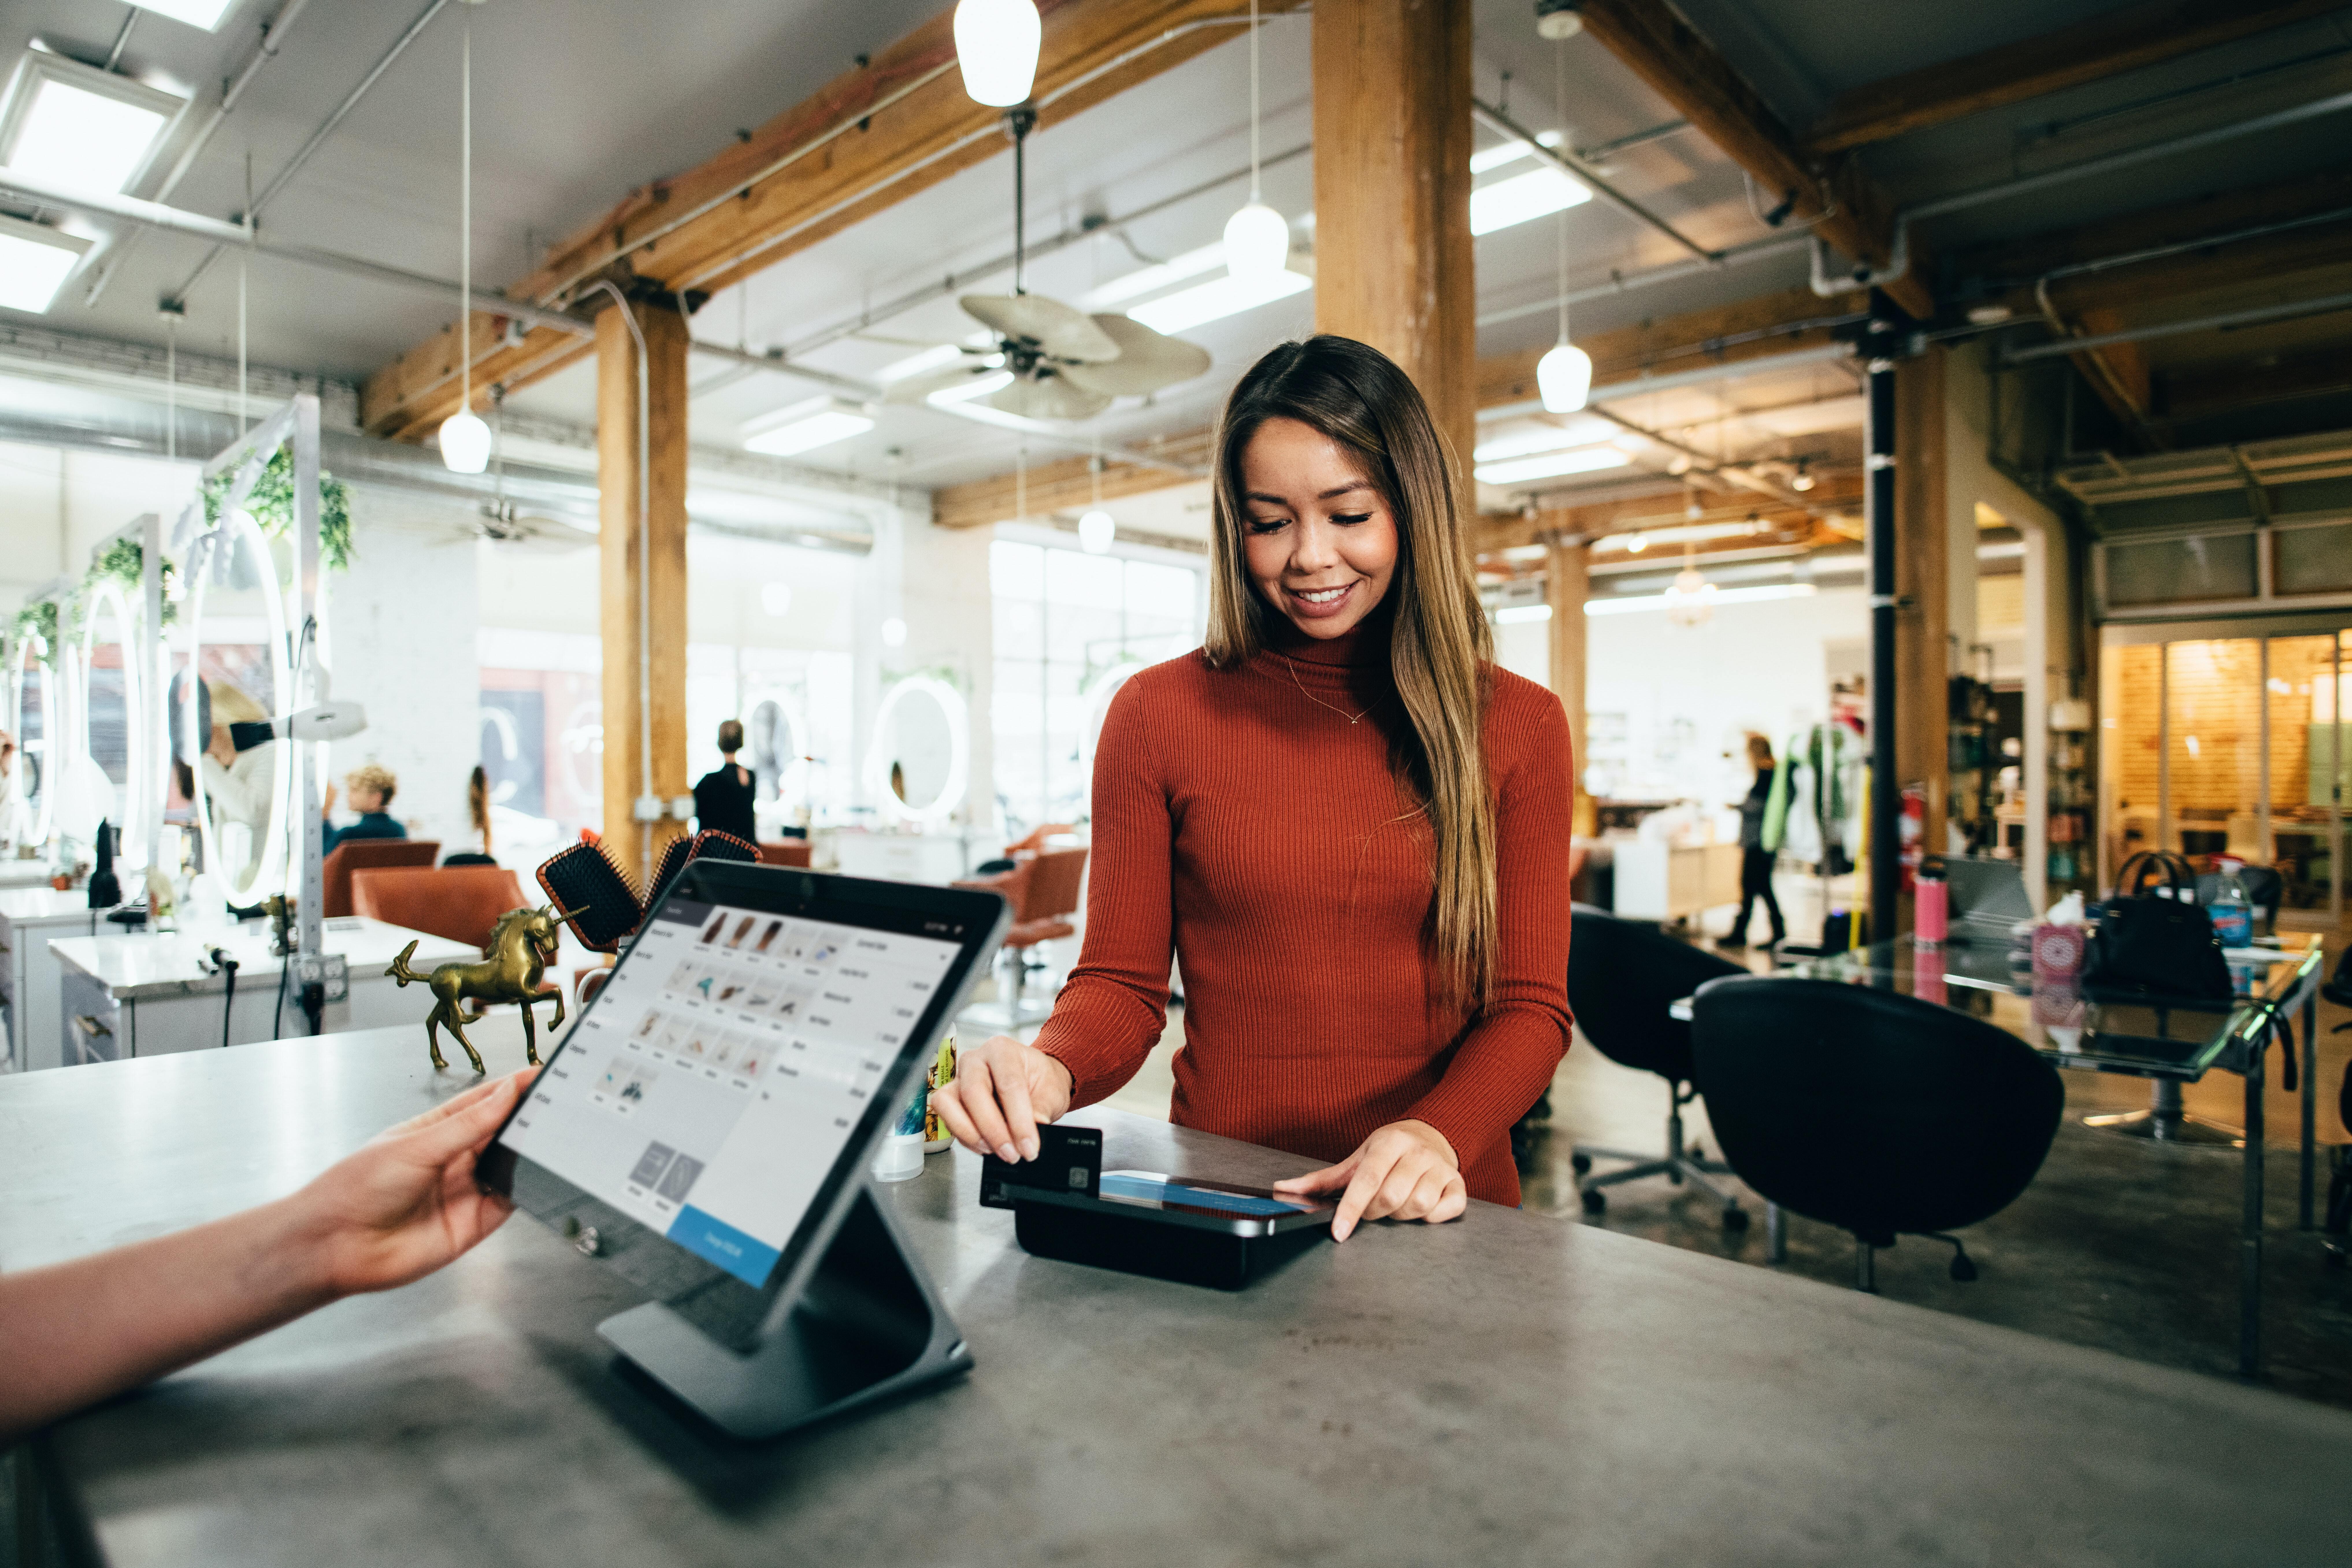 Frau zahlt am POS mit Kreditkarte